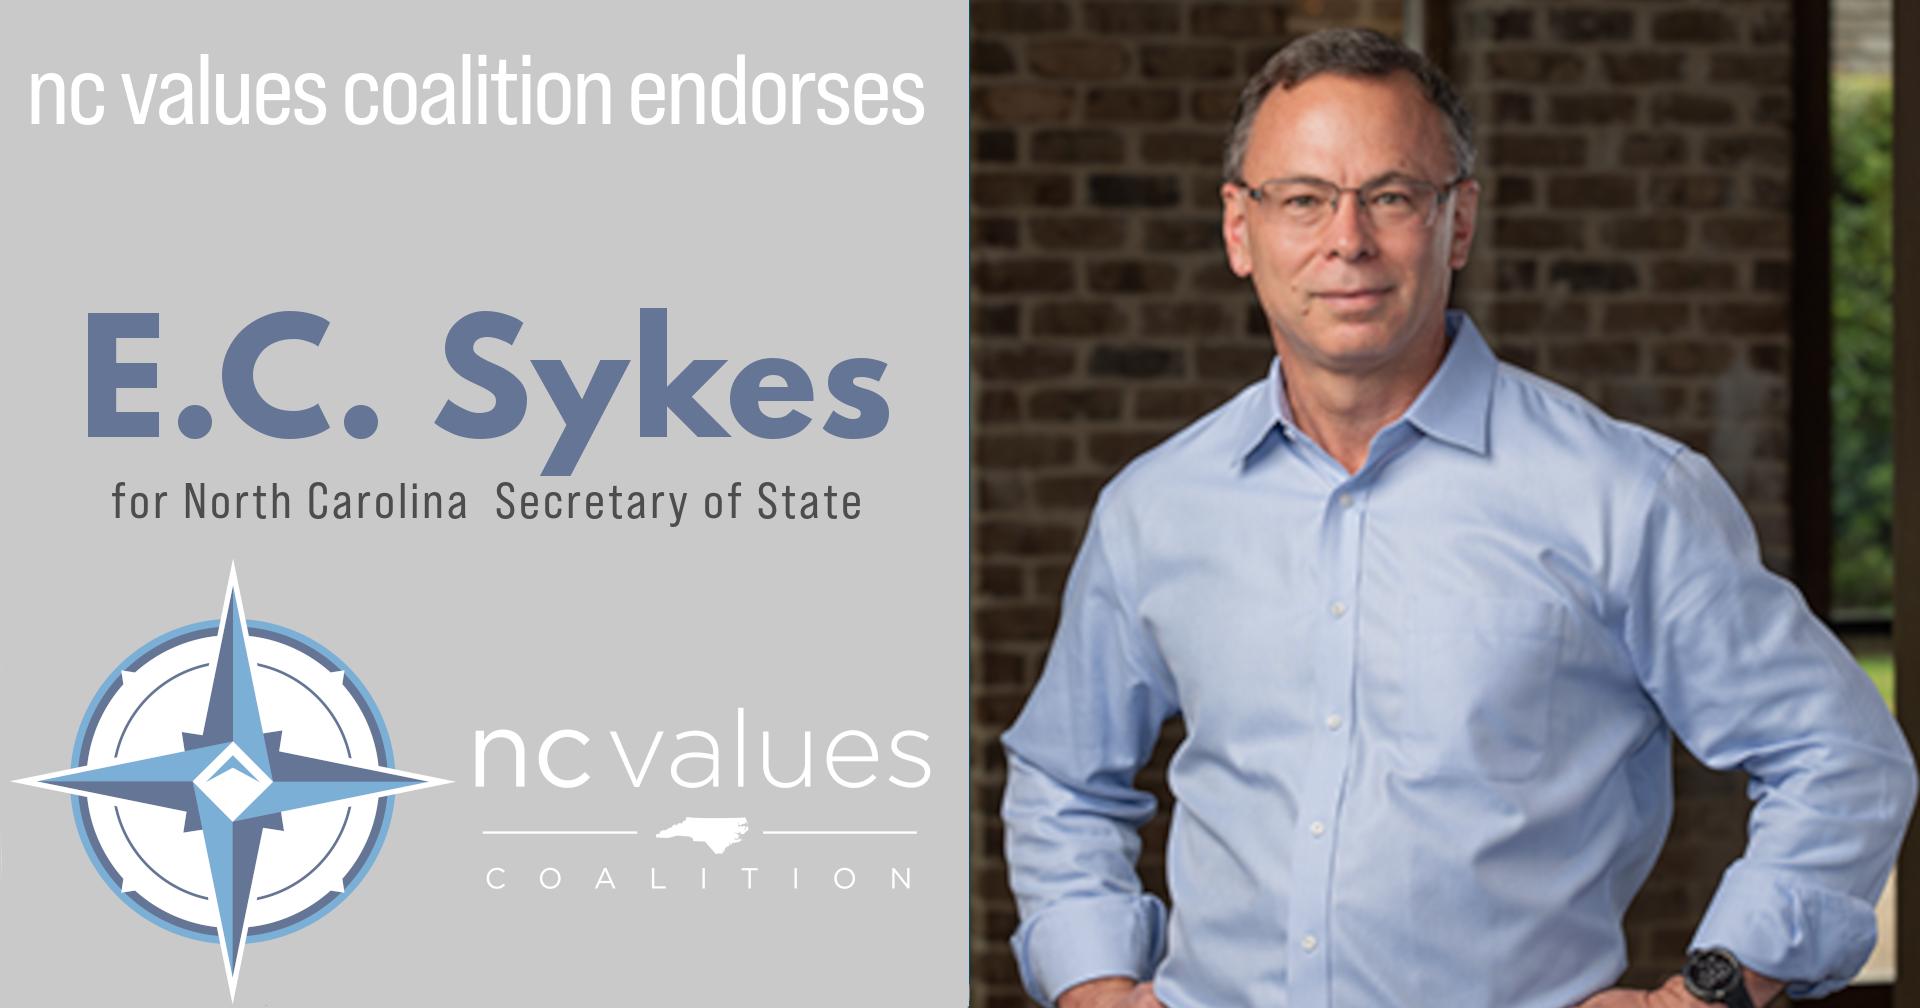 EC Sykes